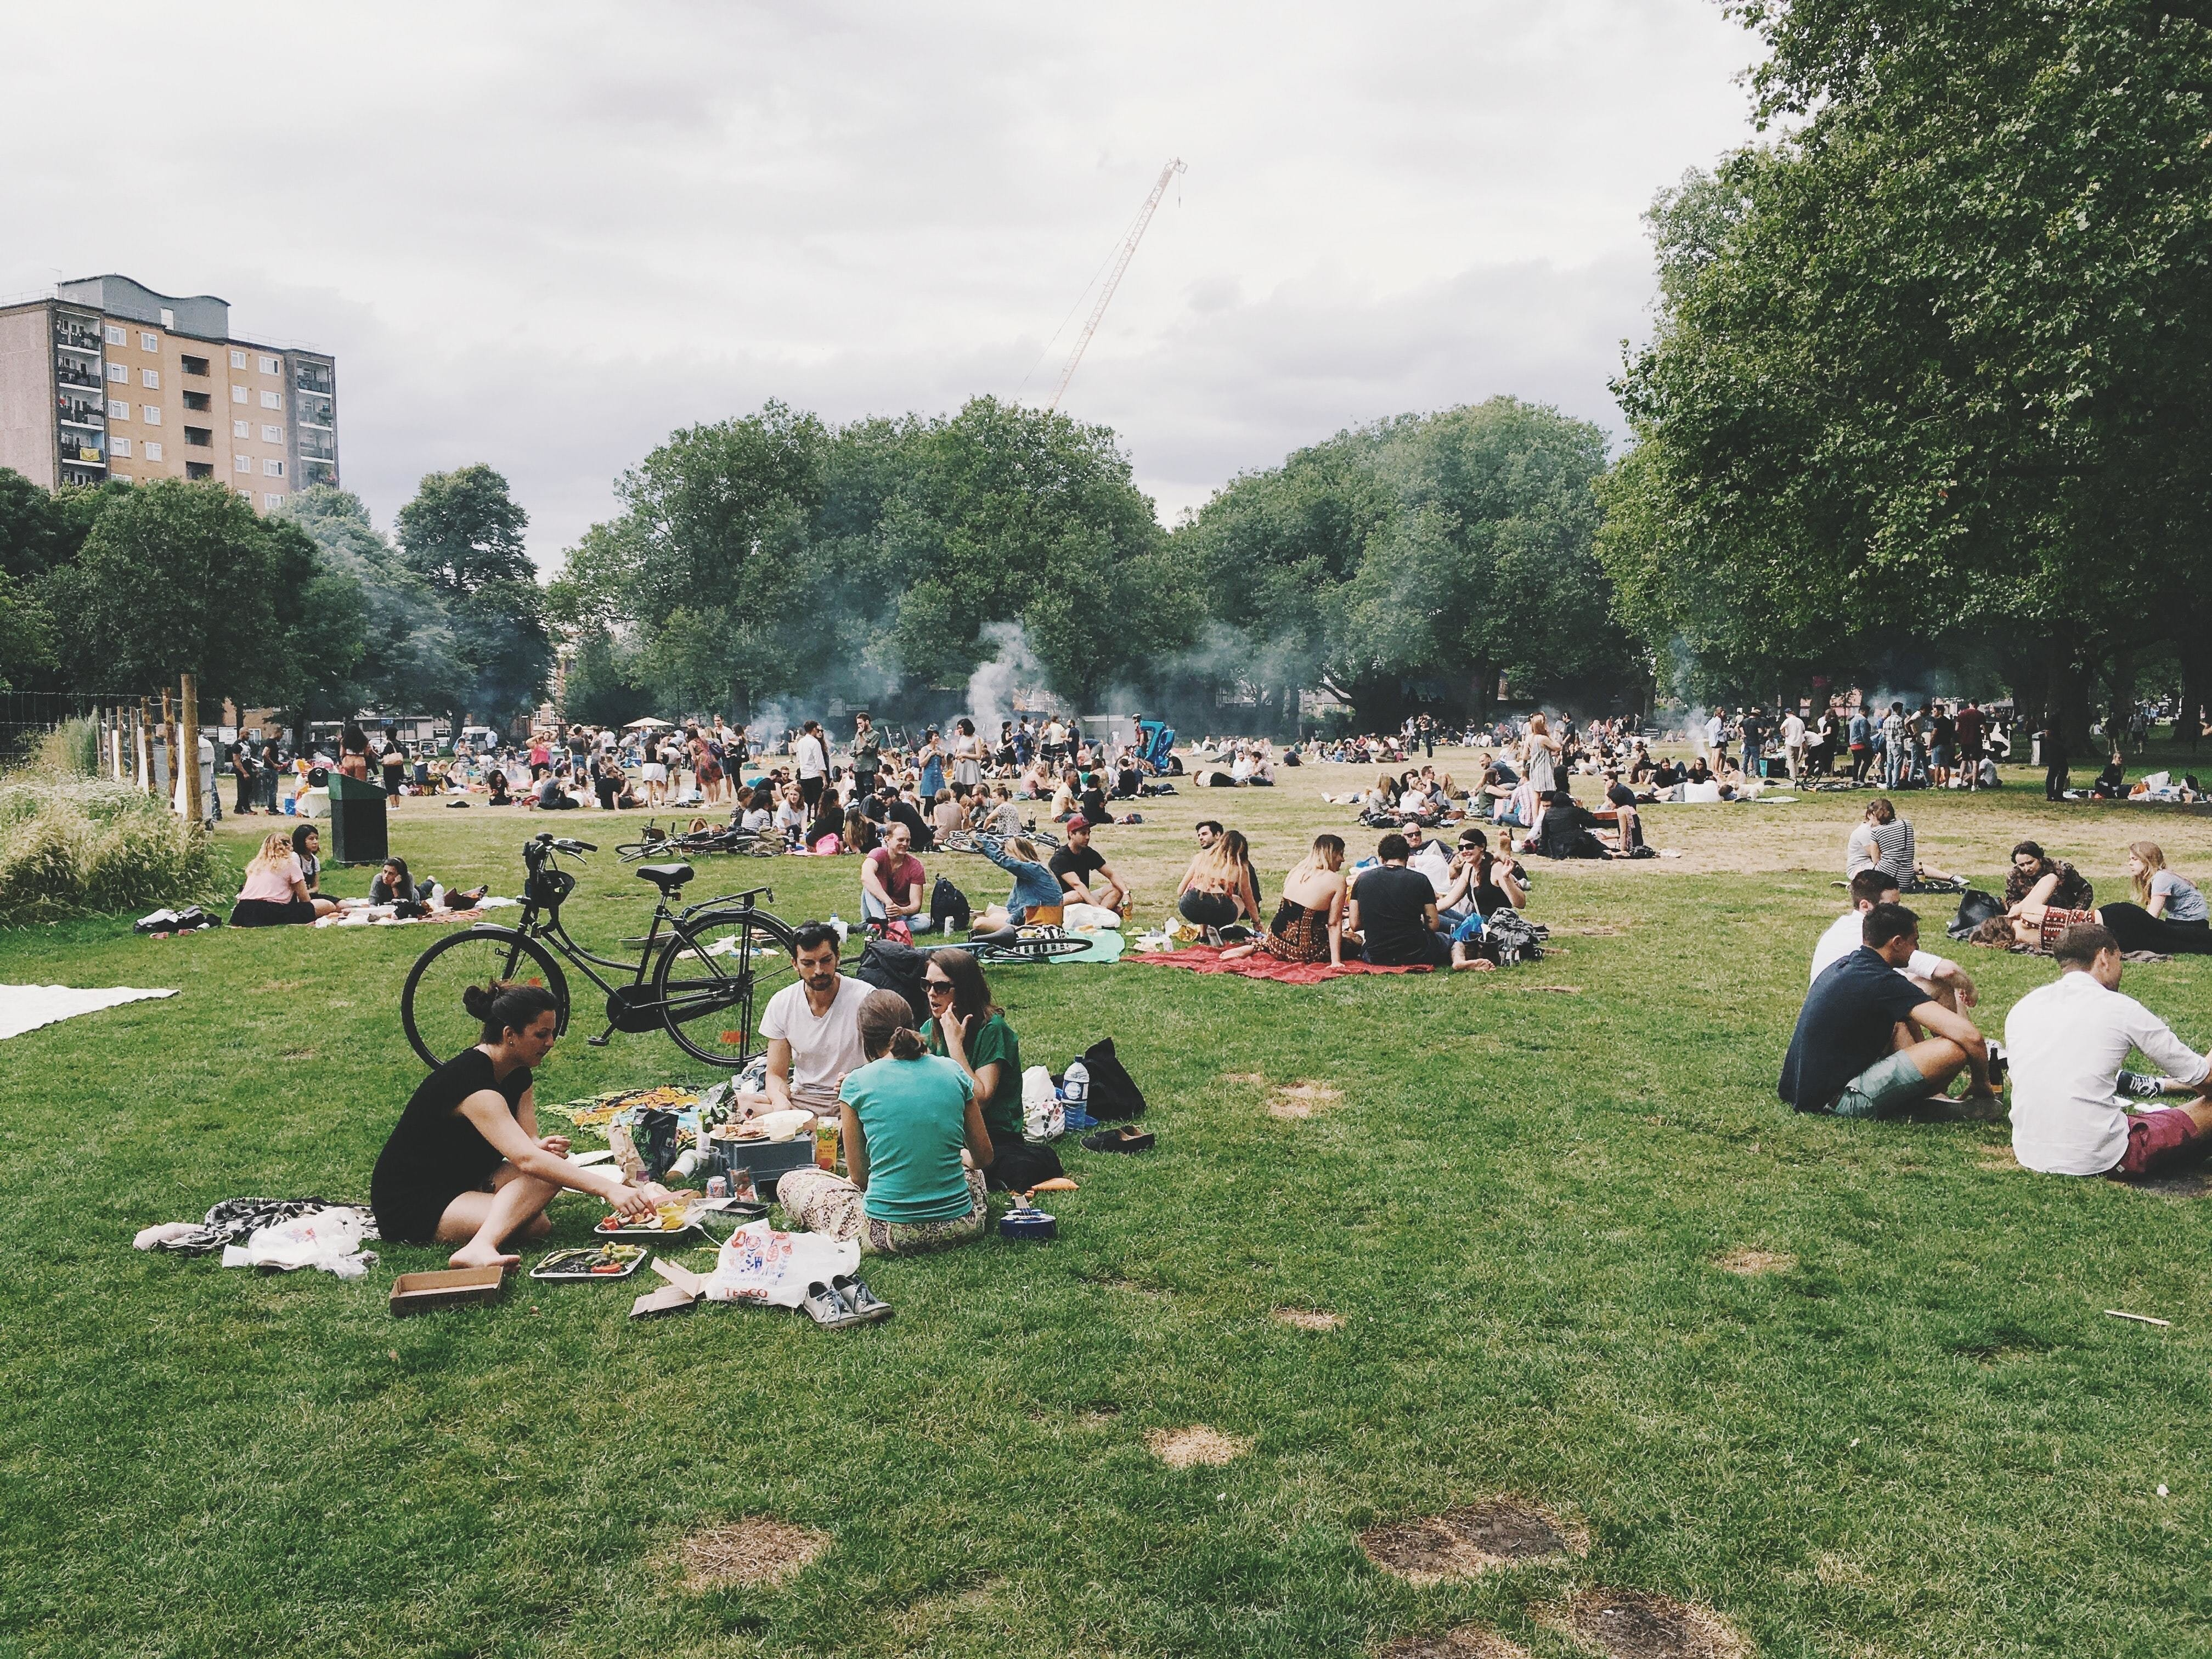 people having picnics in an urban park